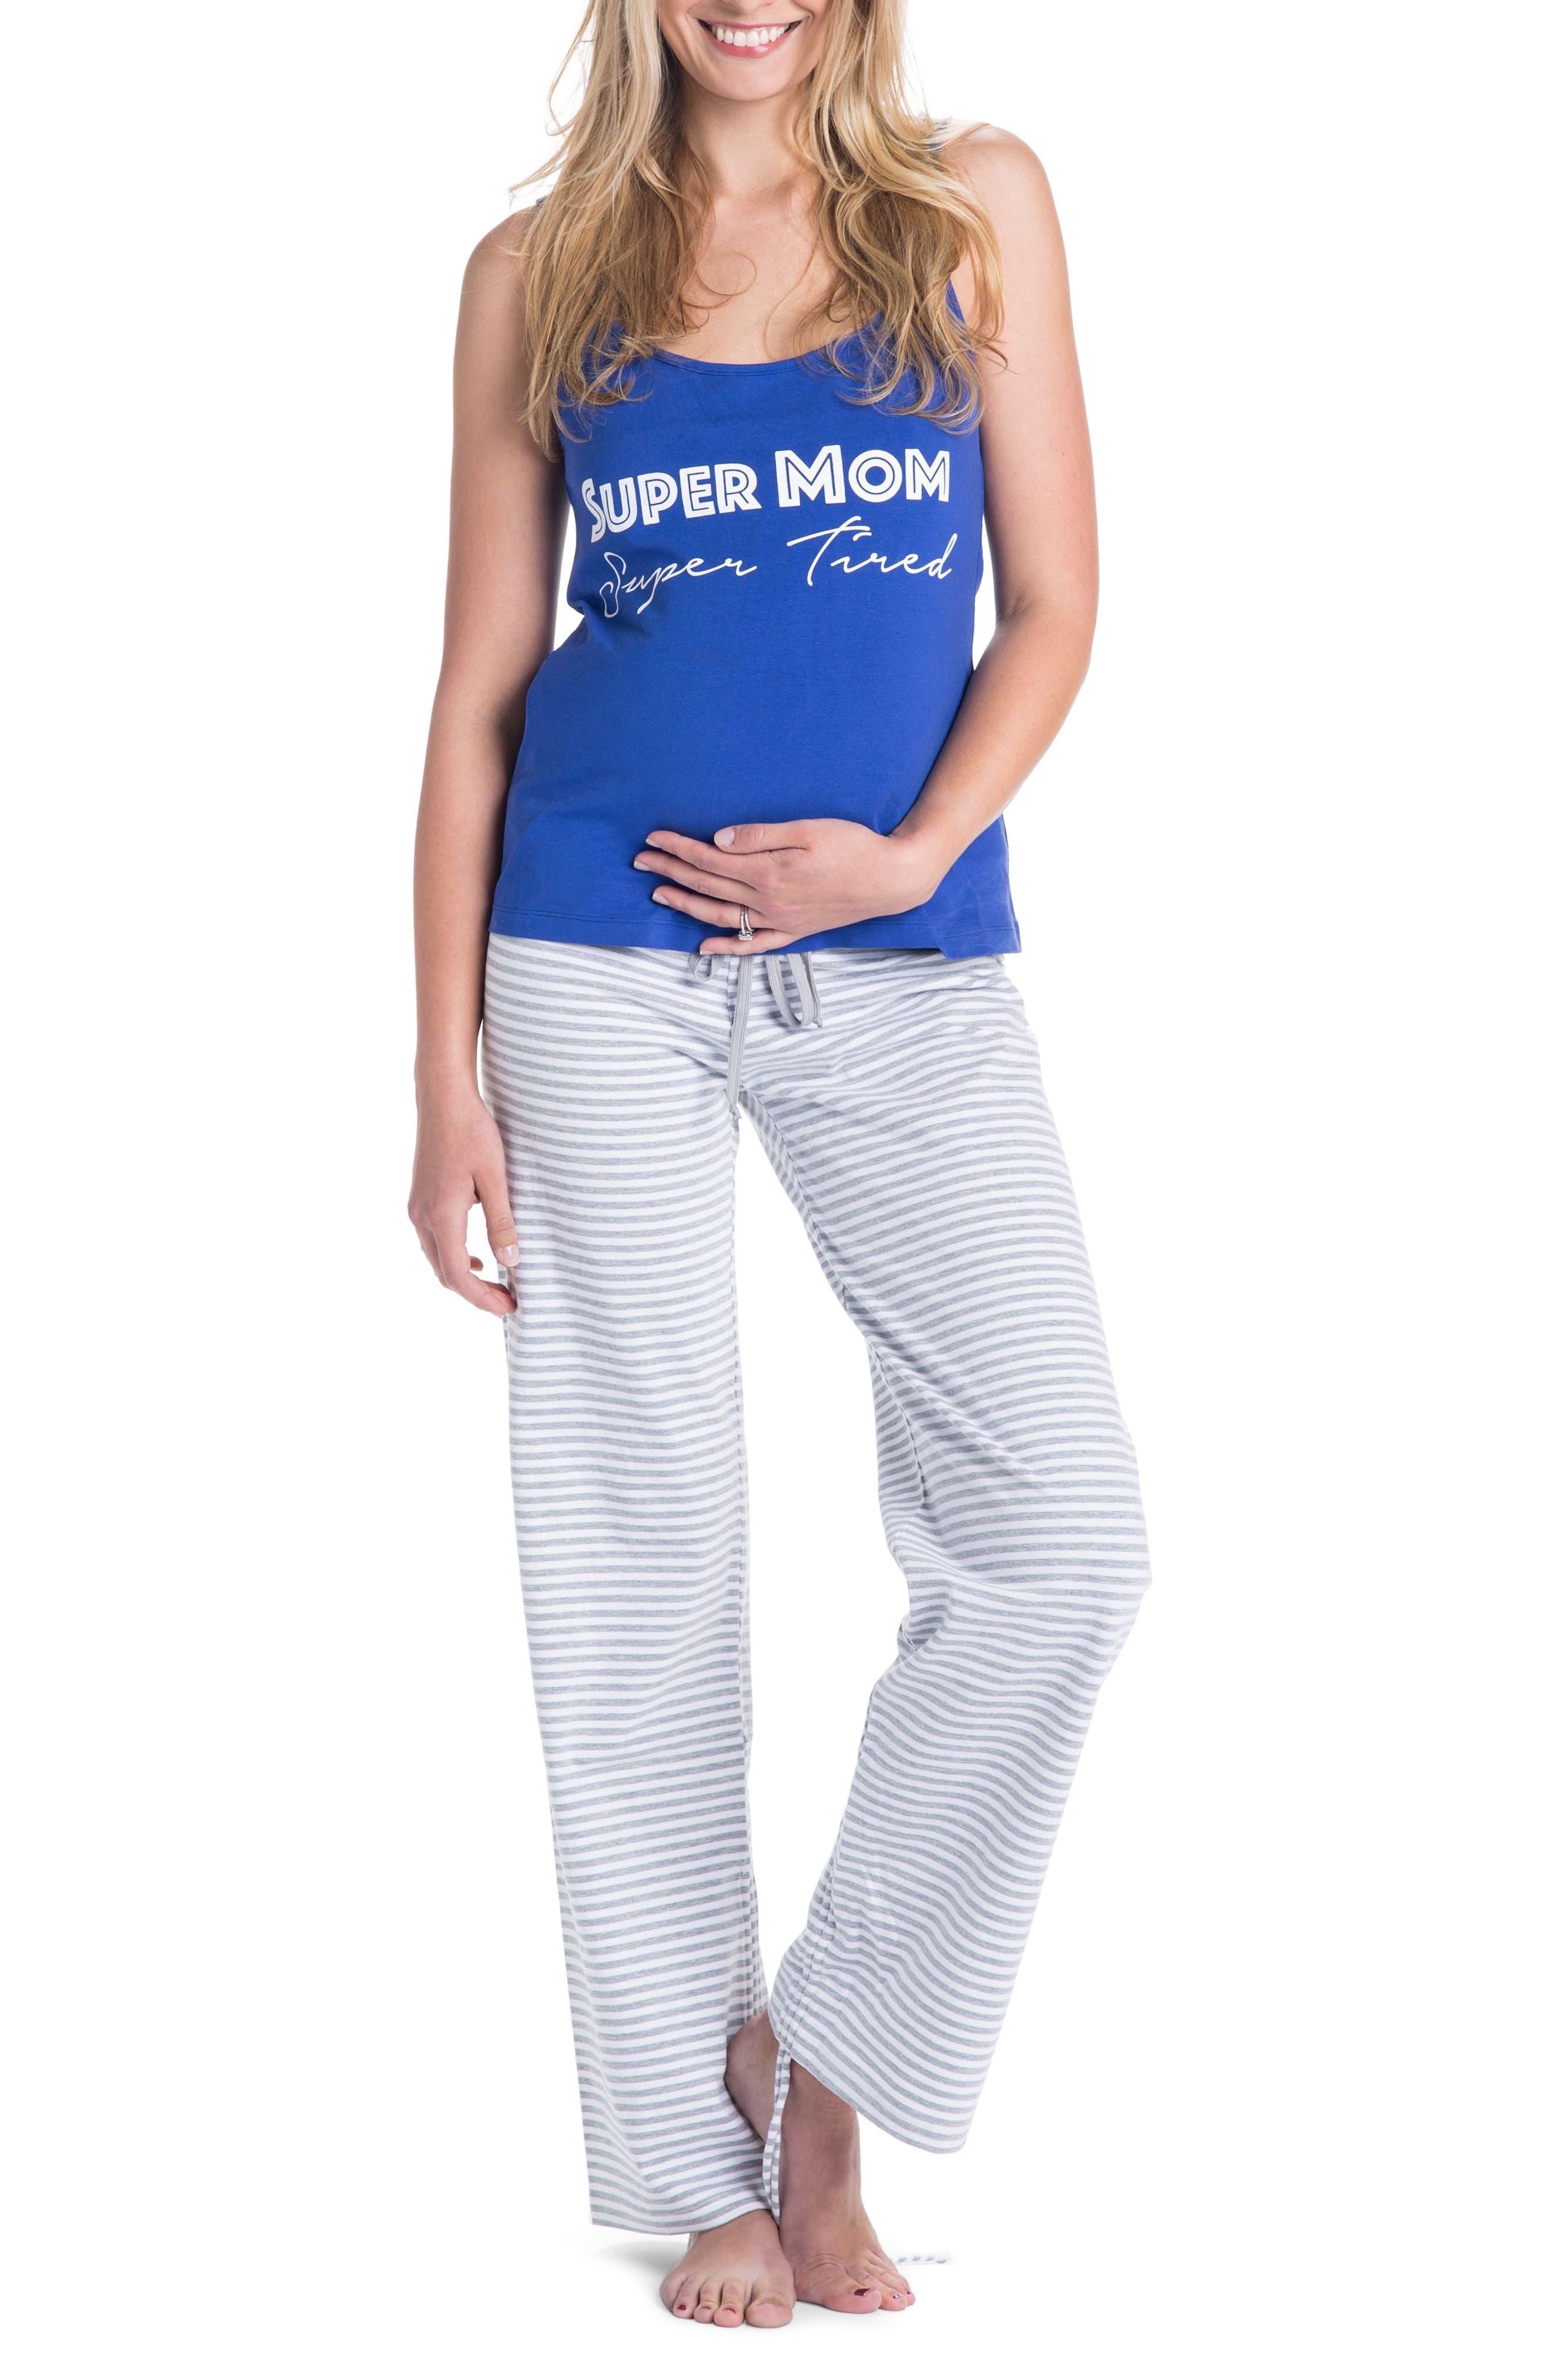 Trudy Super Mom Maternity/Nursing Pajamas,                             Main thumbnail 1, color,                             NAVY BLUE/ GRAY/ WHITE STRIPES